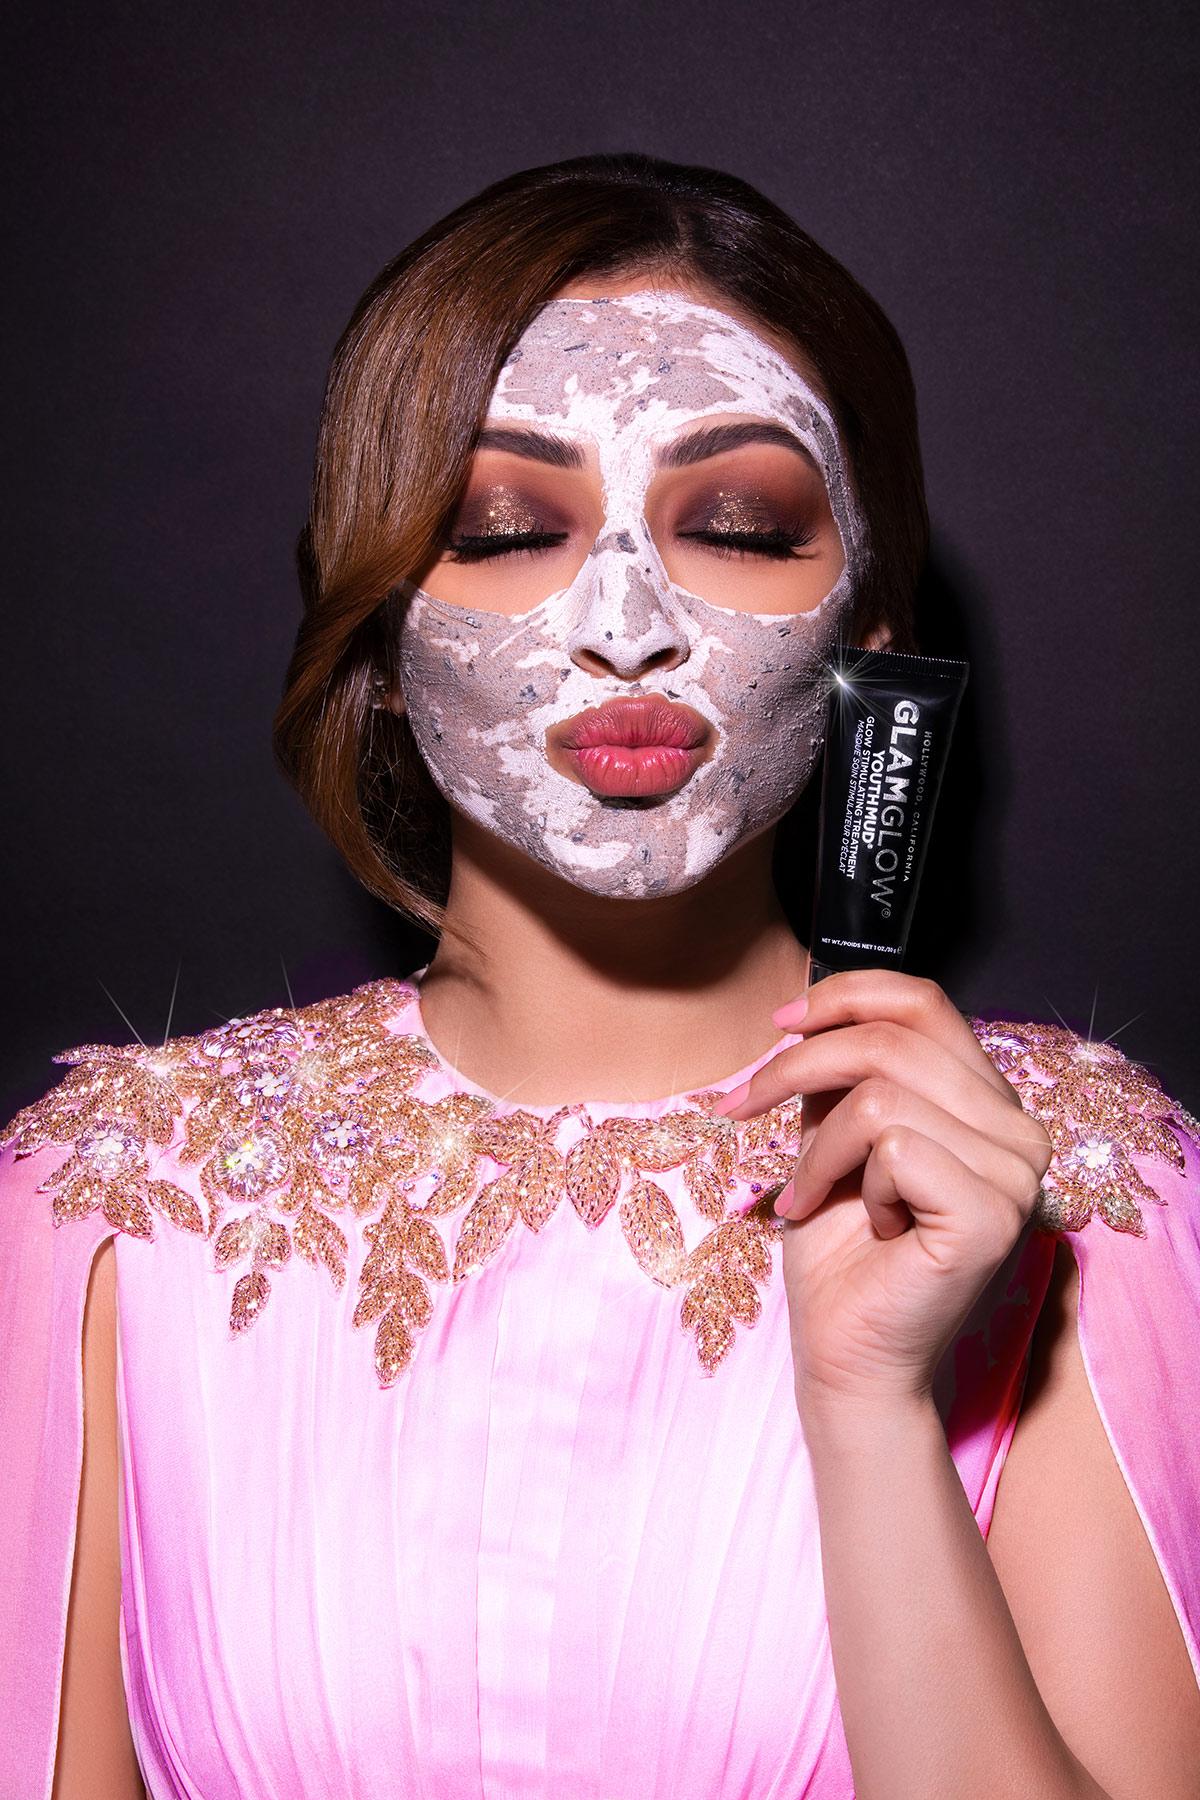 Glam Glow Campaign shoot for Estée Lauder with Shouq Al Hadi by Loesje Kessels